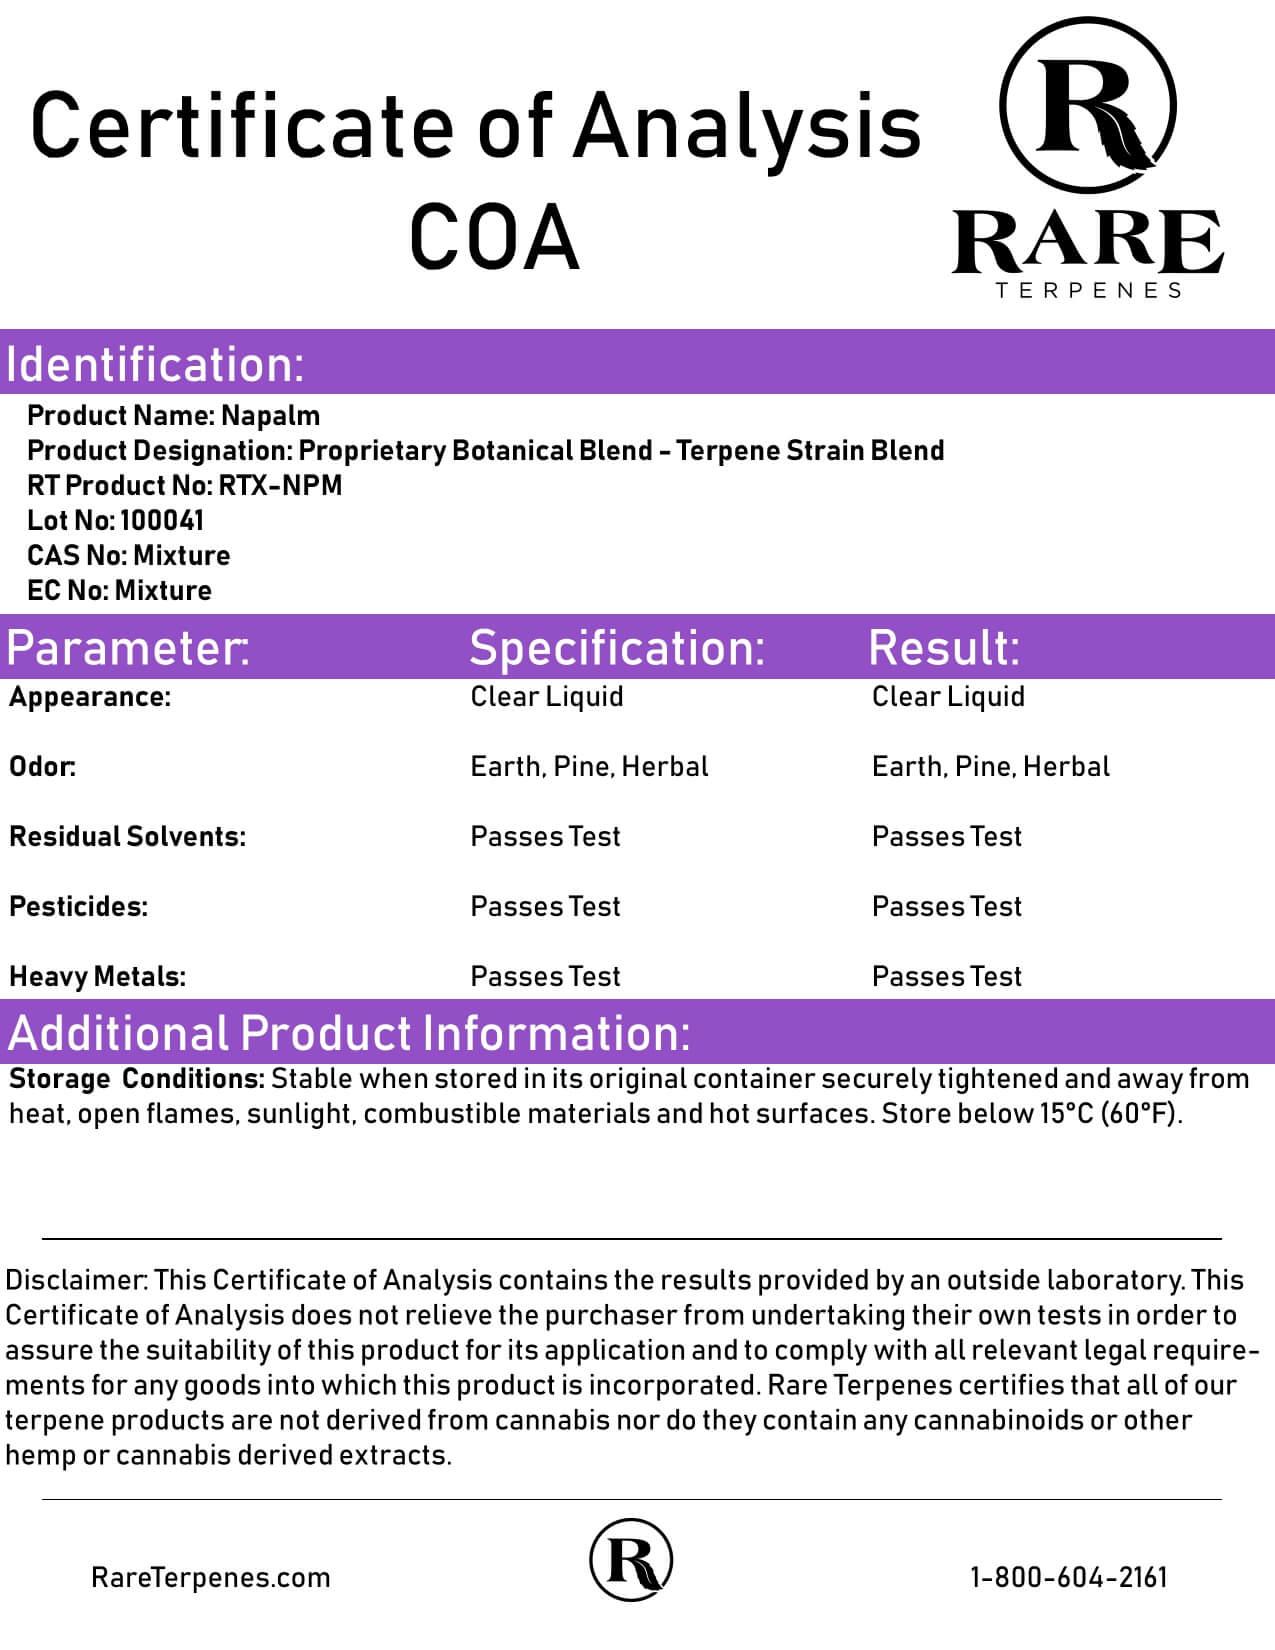 Rare Terpenes Tepene Strain Blends Napalm Lab Report